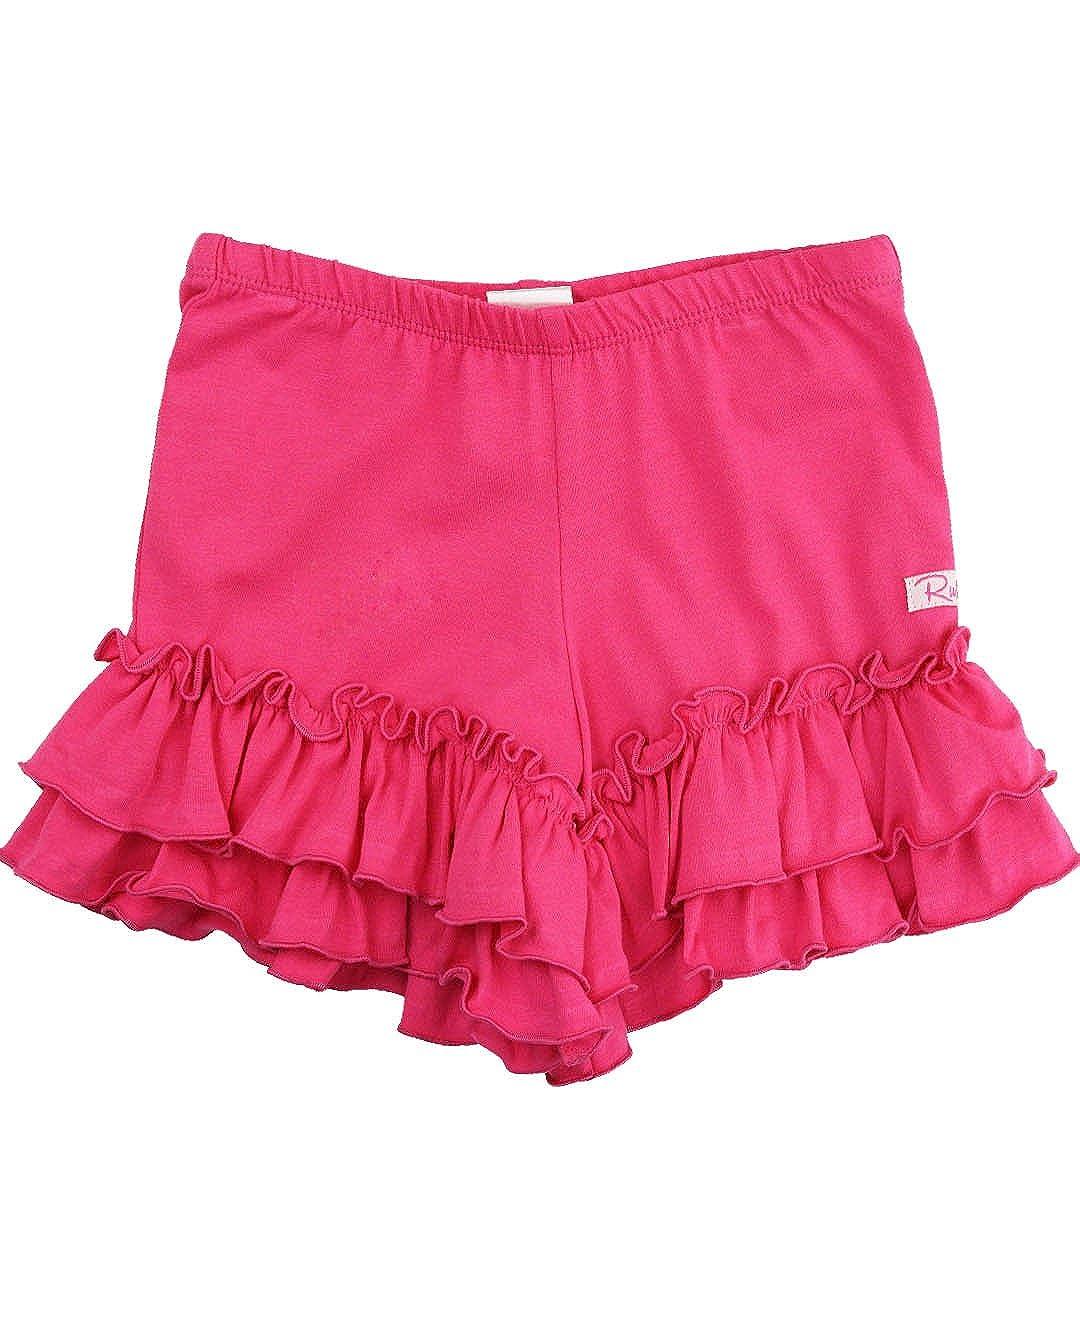 RuffleButts Little Girls Pull-On Flowy Knit Play Shorts w//Ruffle Trim GTKYYXX-FL00-SC-TDLR